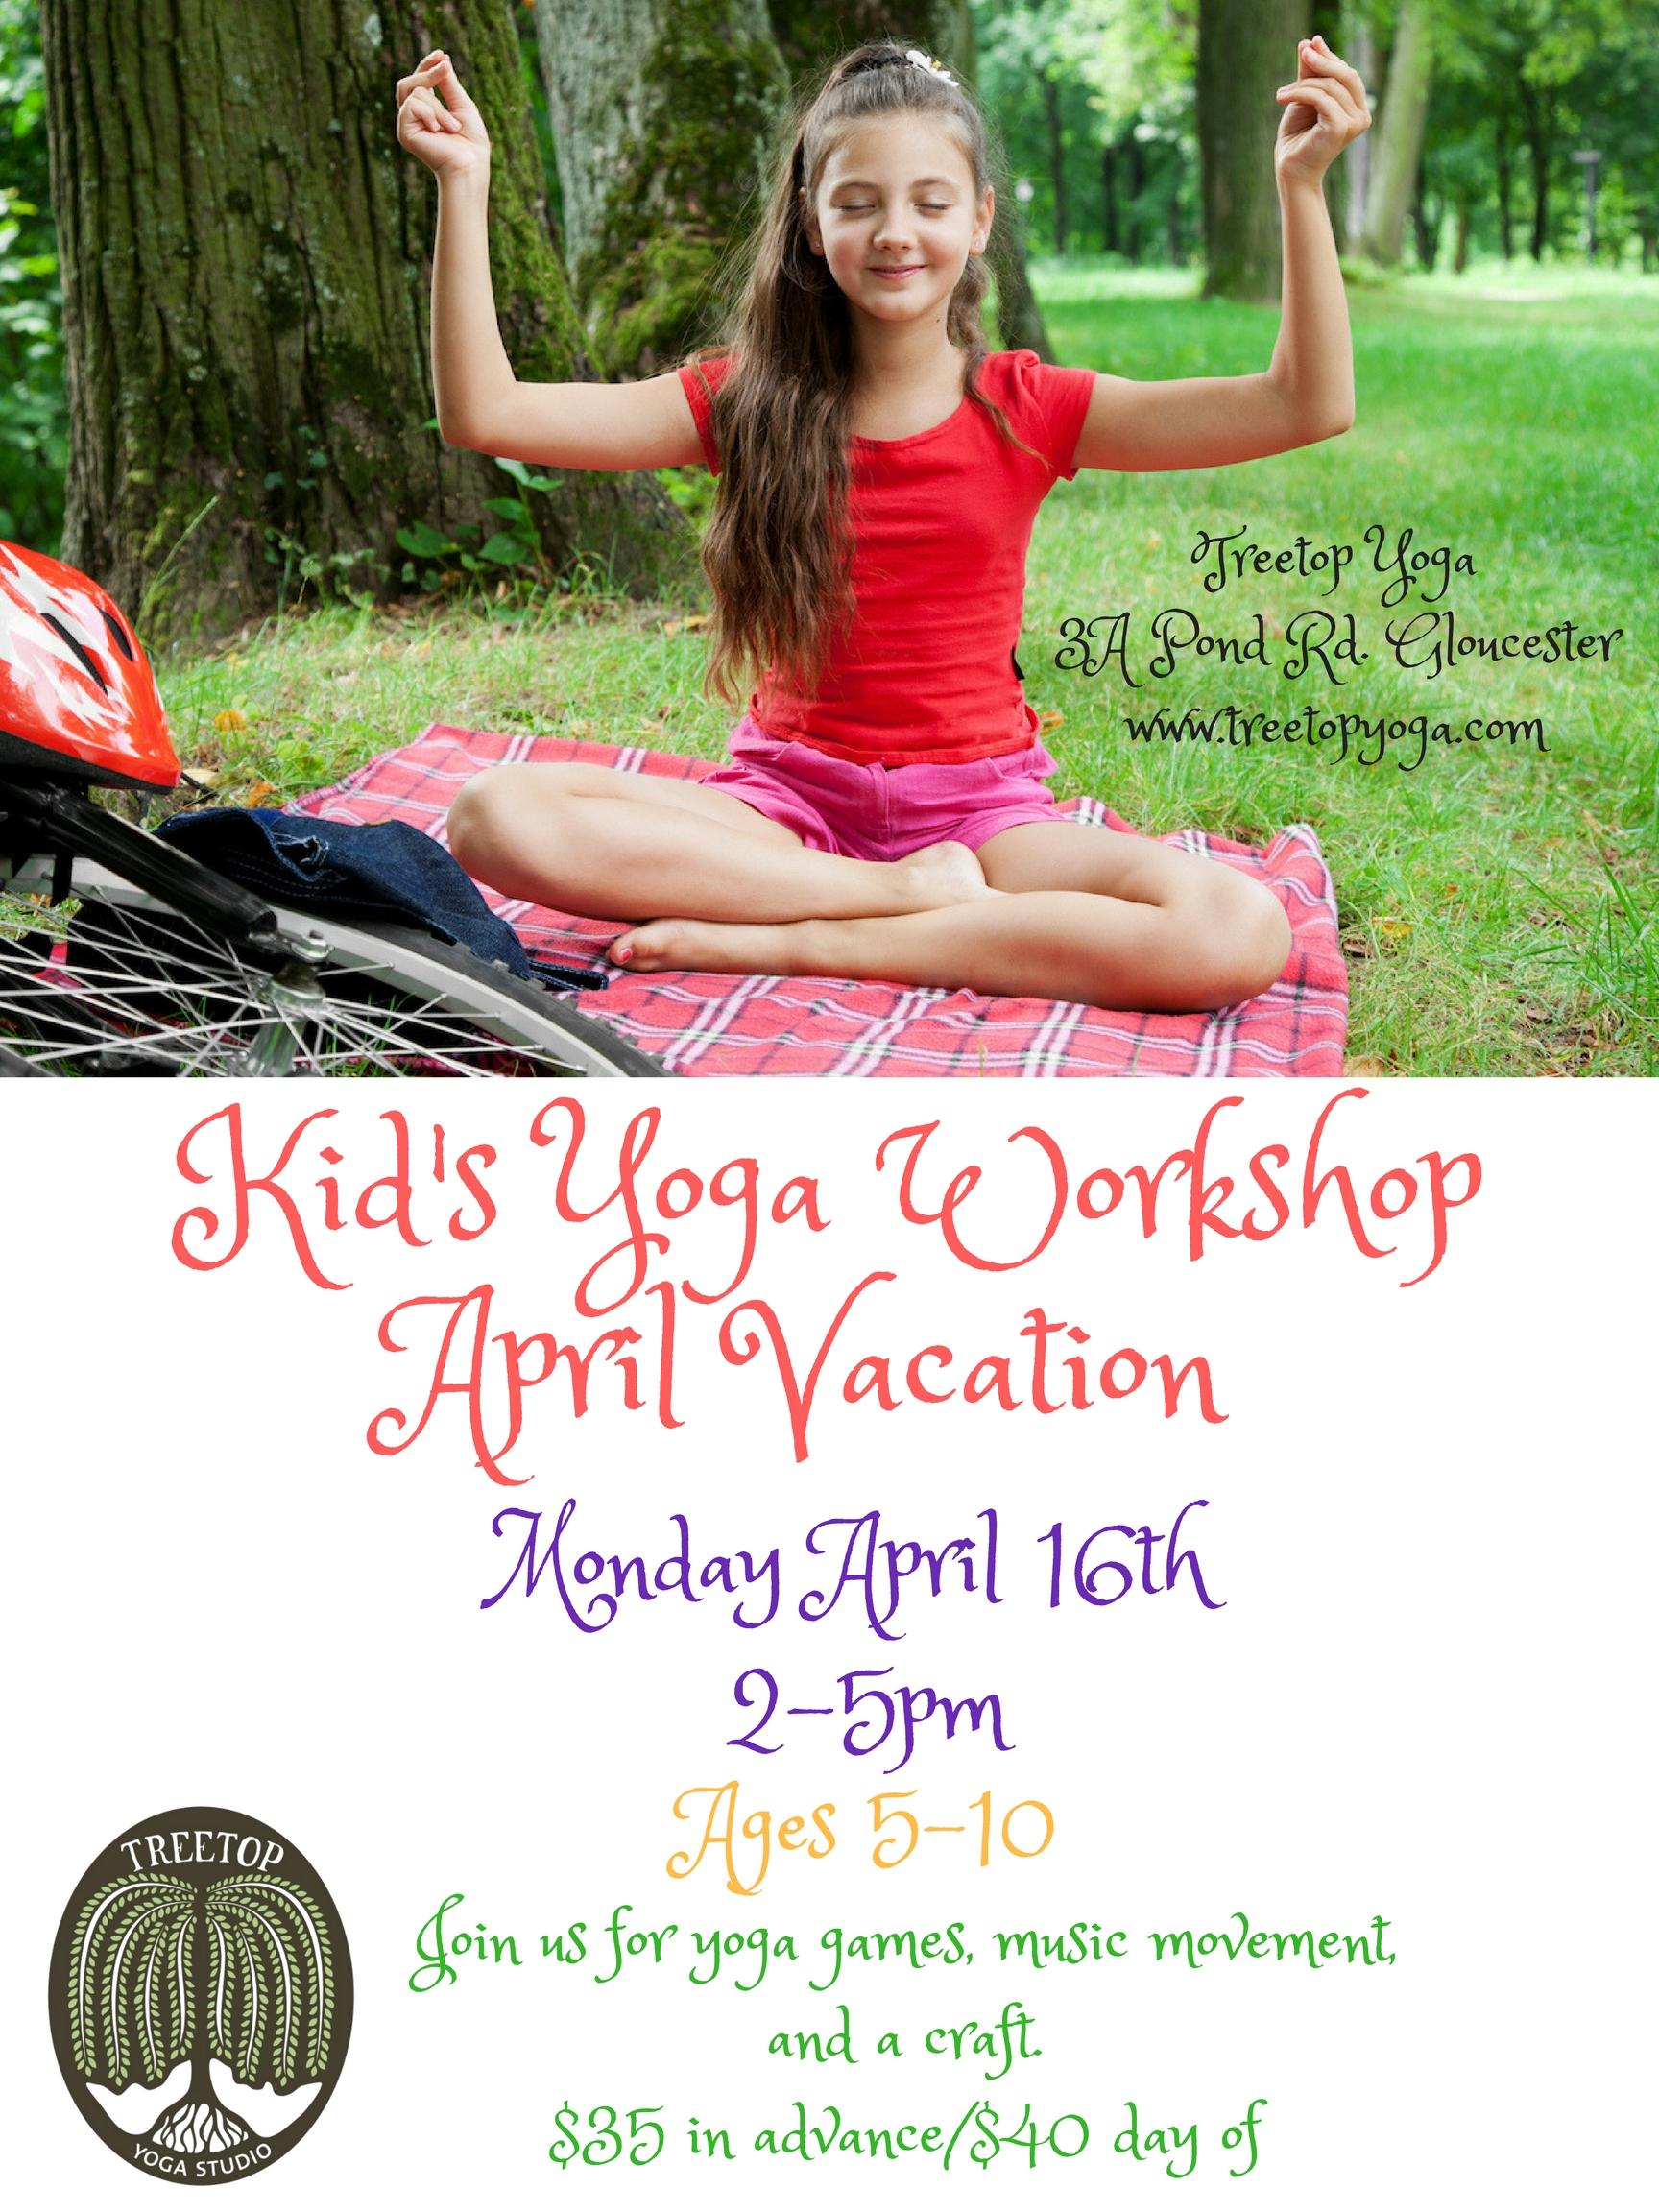 April Vacation Kids Yoga Workshop – Cape Ann Wellness